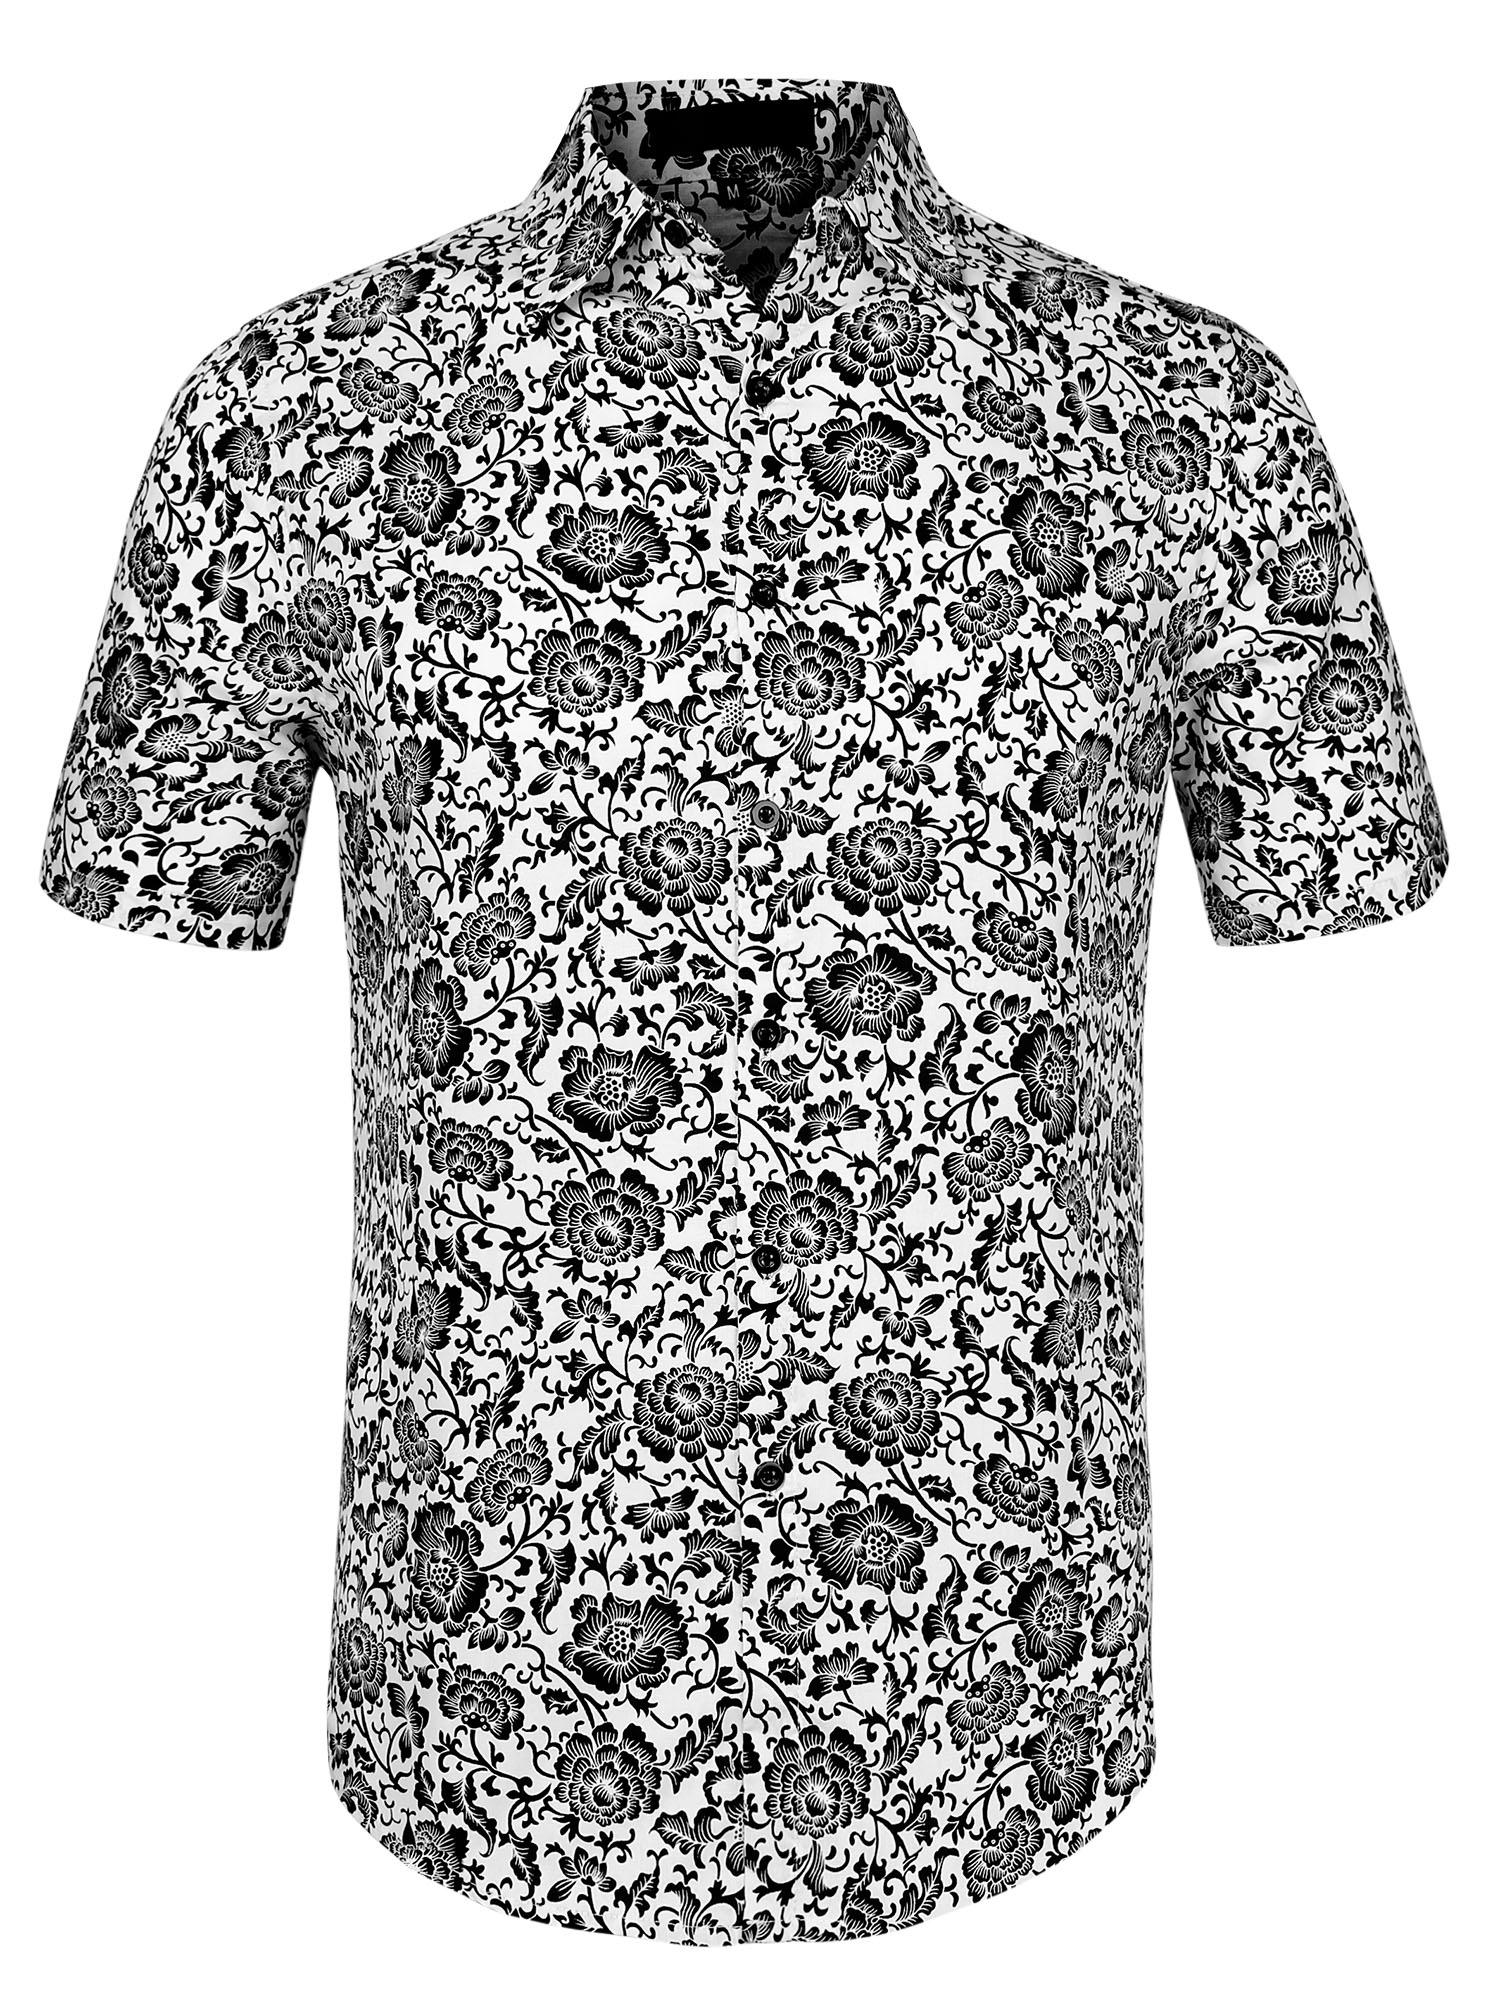 Men Summer Short Sleeves Button Front Floral Print Cotton Hawaiian Shirt White L